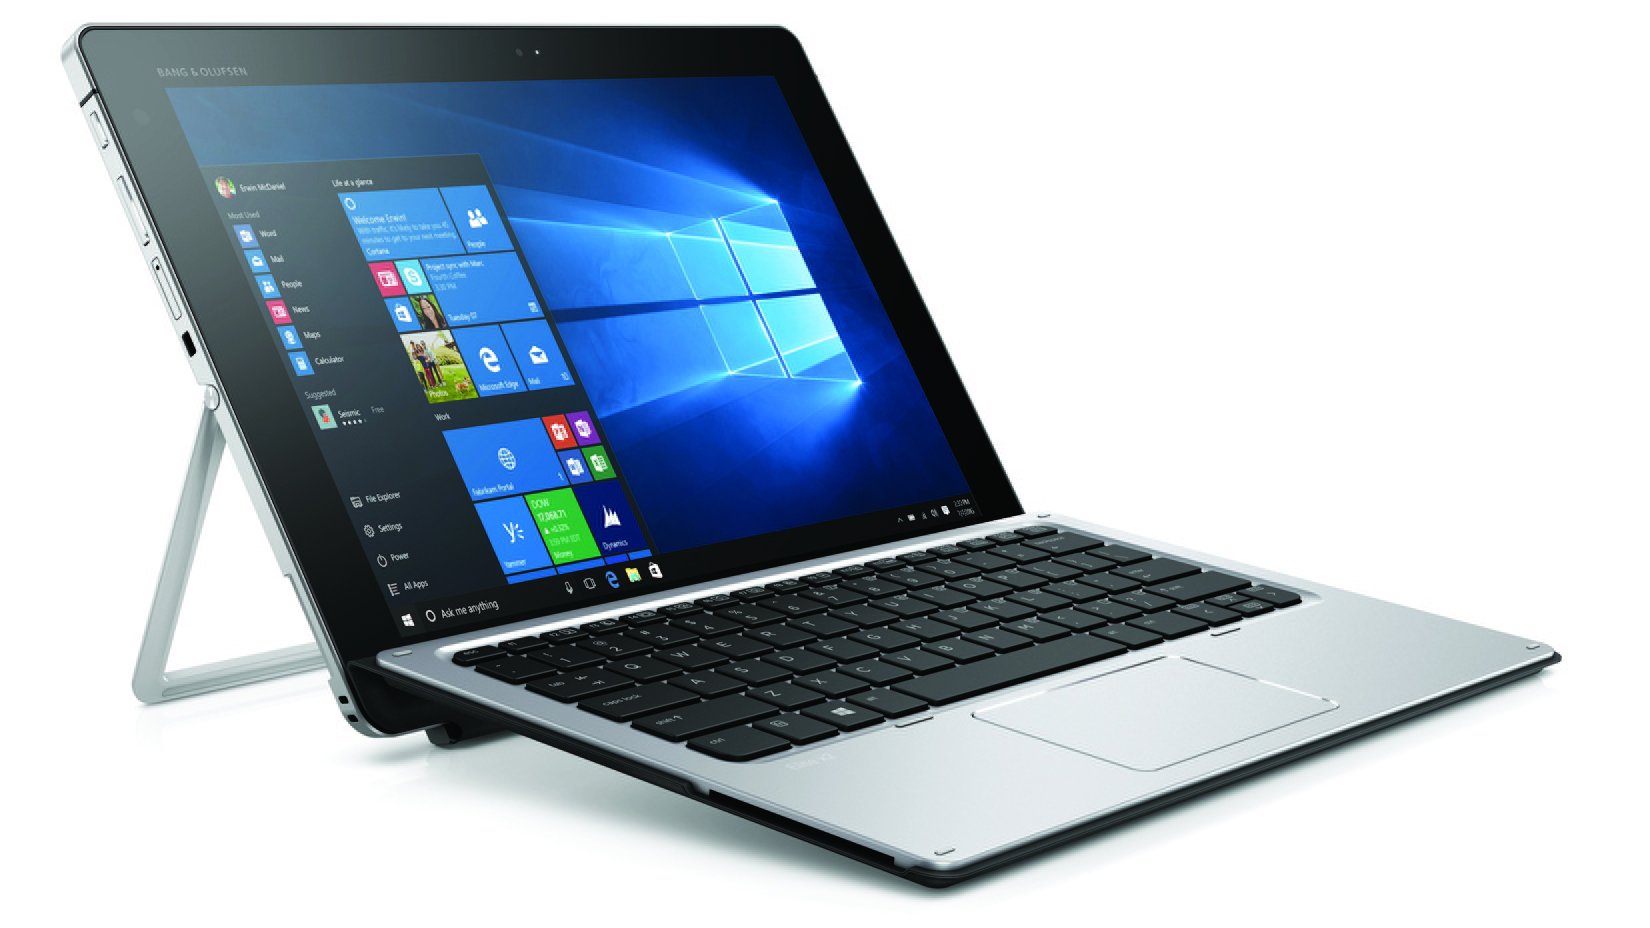 hp stellt neues elite x2 12 zoll windows 10 tablet vor. Black Bedroom Furniture Sets. Home Design Ideas